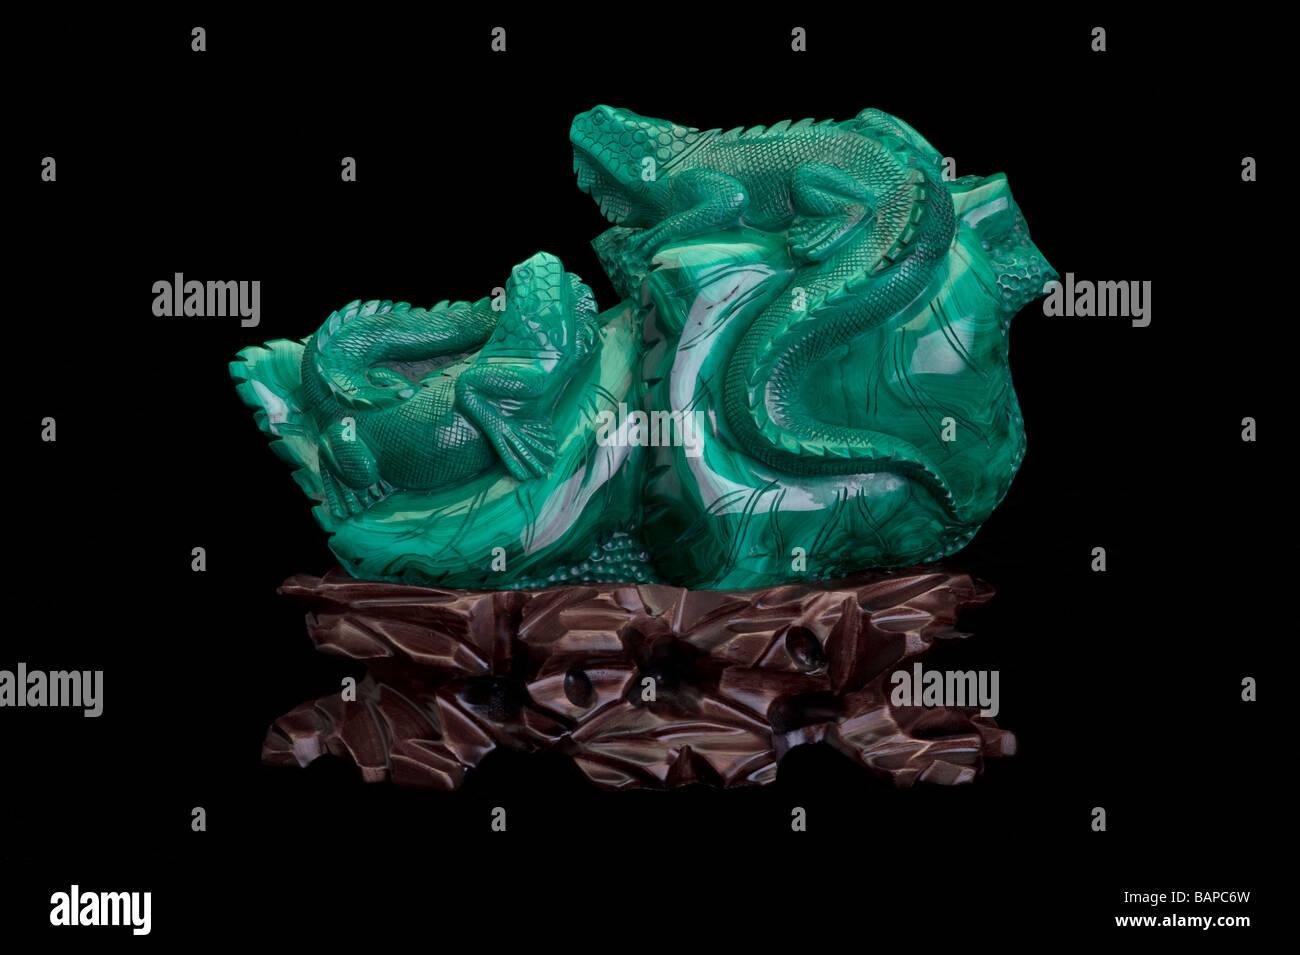 Mineral de Malaquita tallando sobre fondo negro Foto de stock